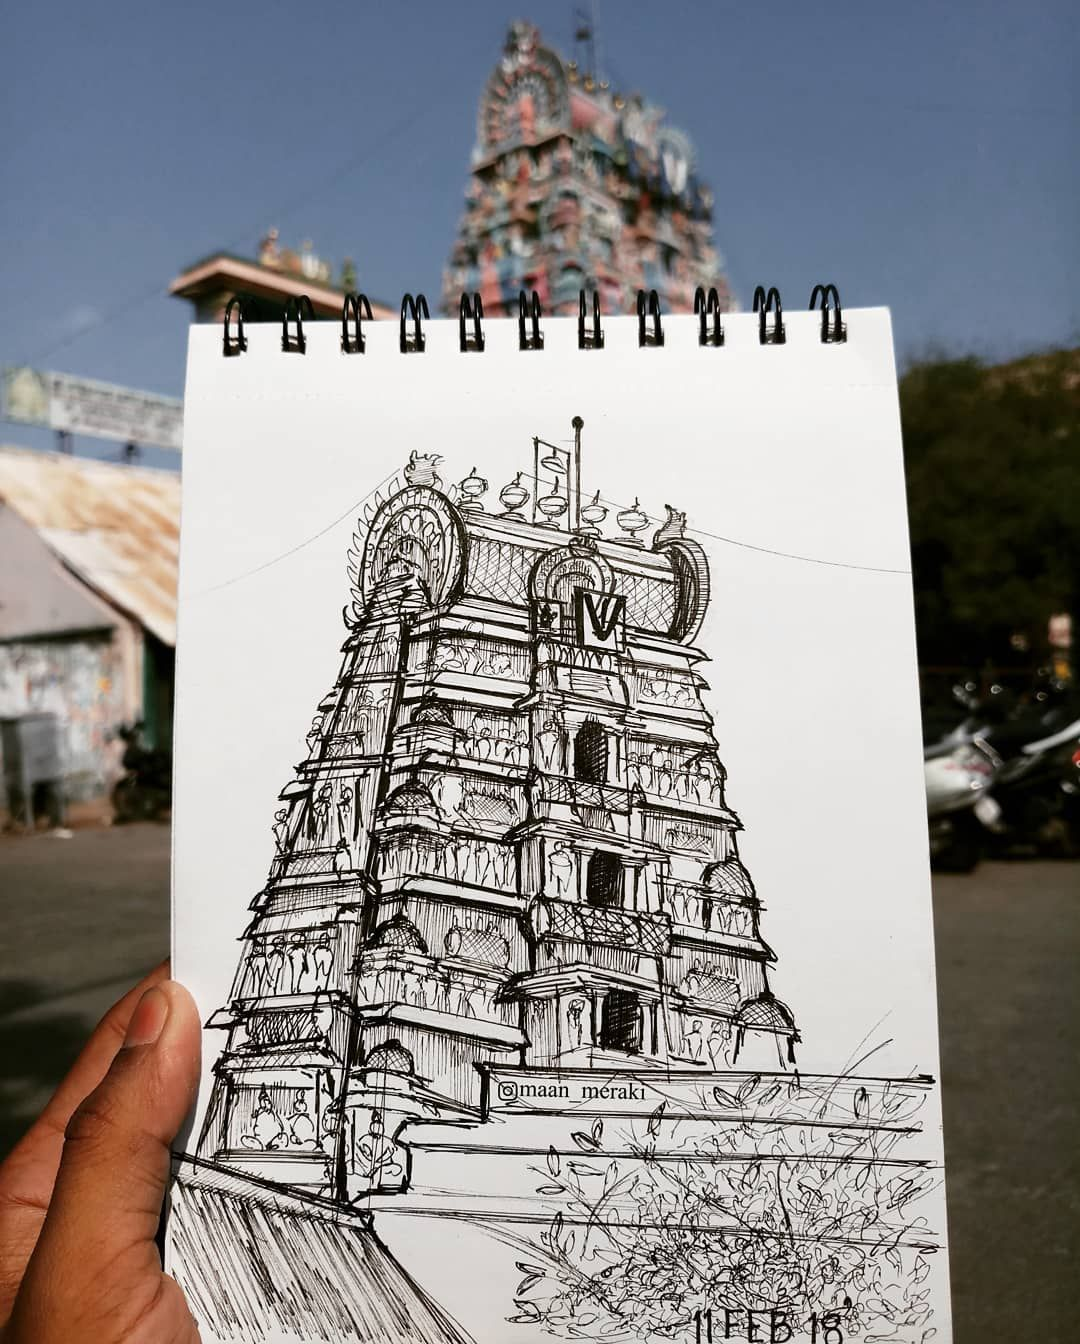 Intricacy in dravidian architecture parthasarathy temple chennai maan meraki